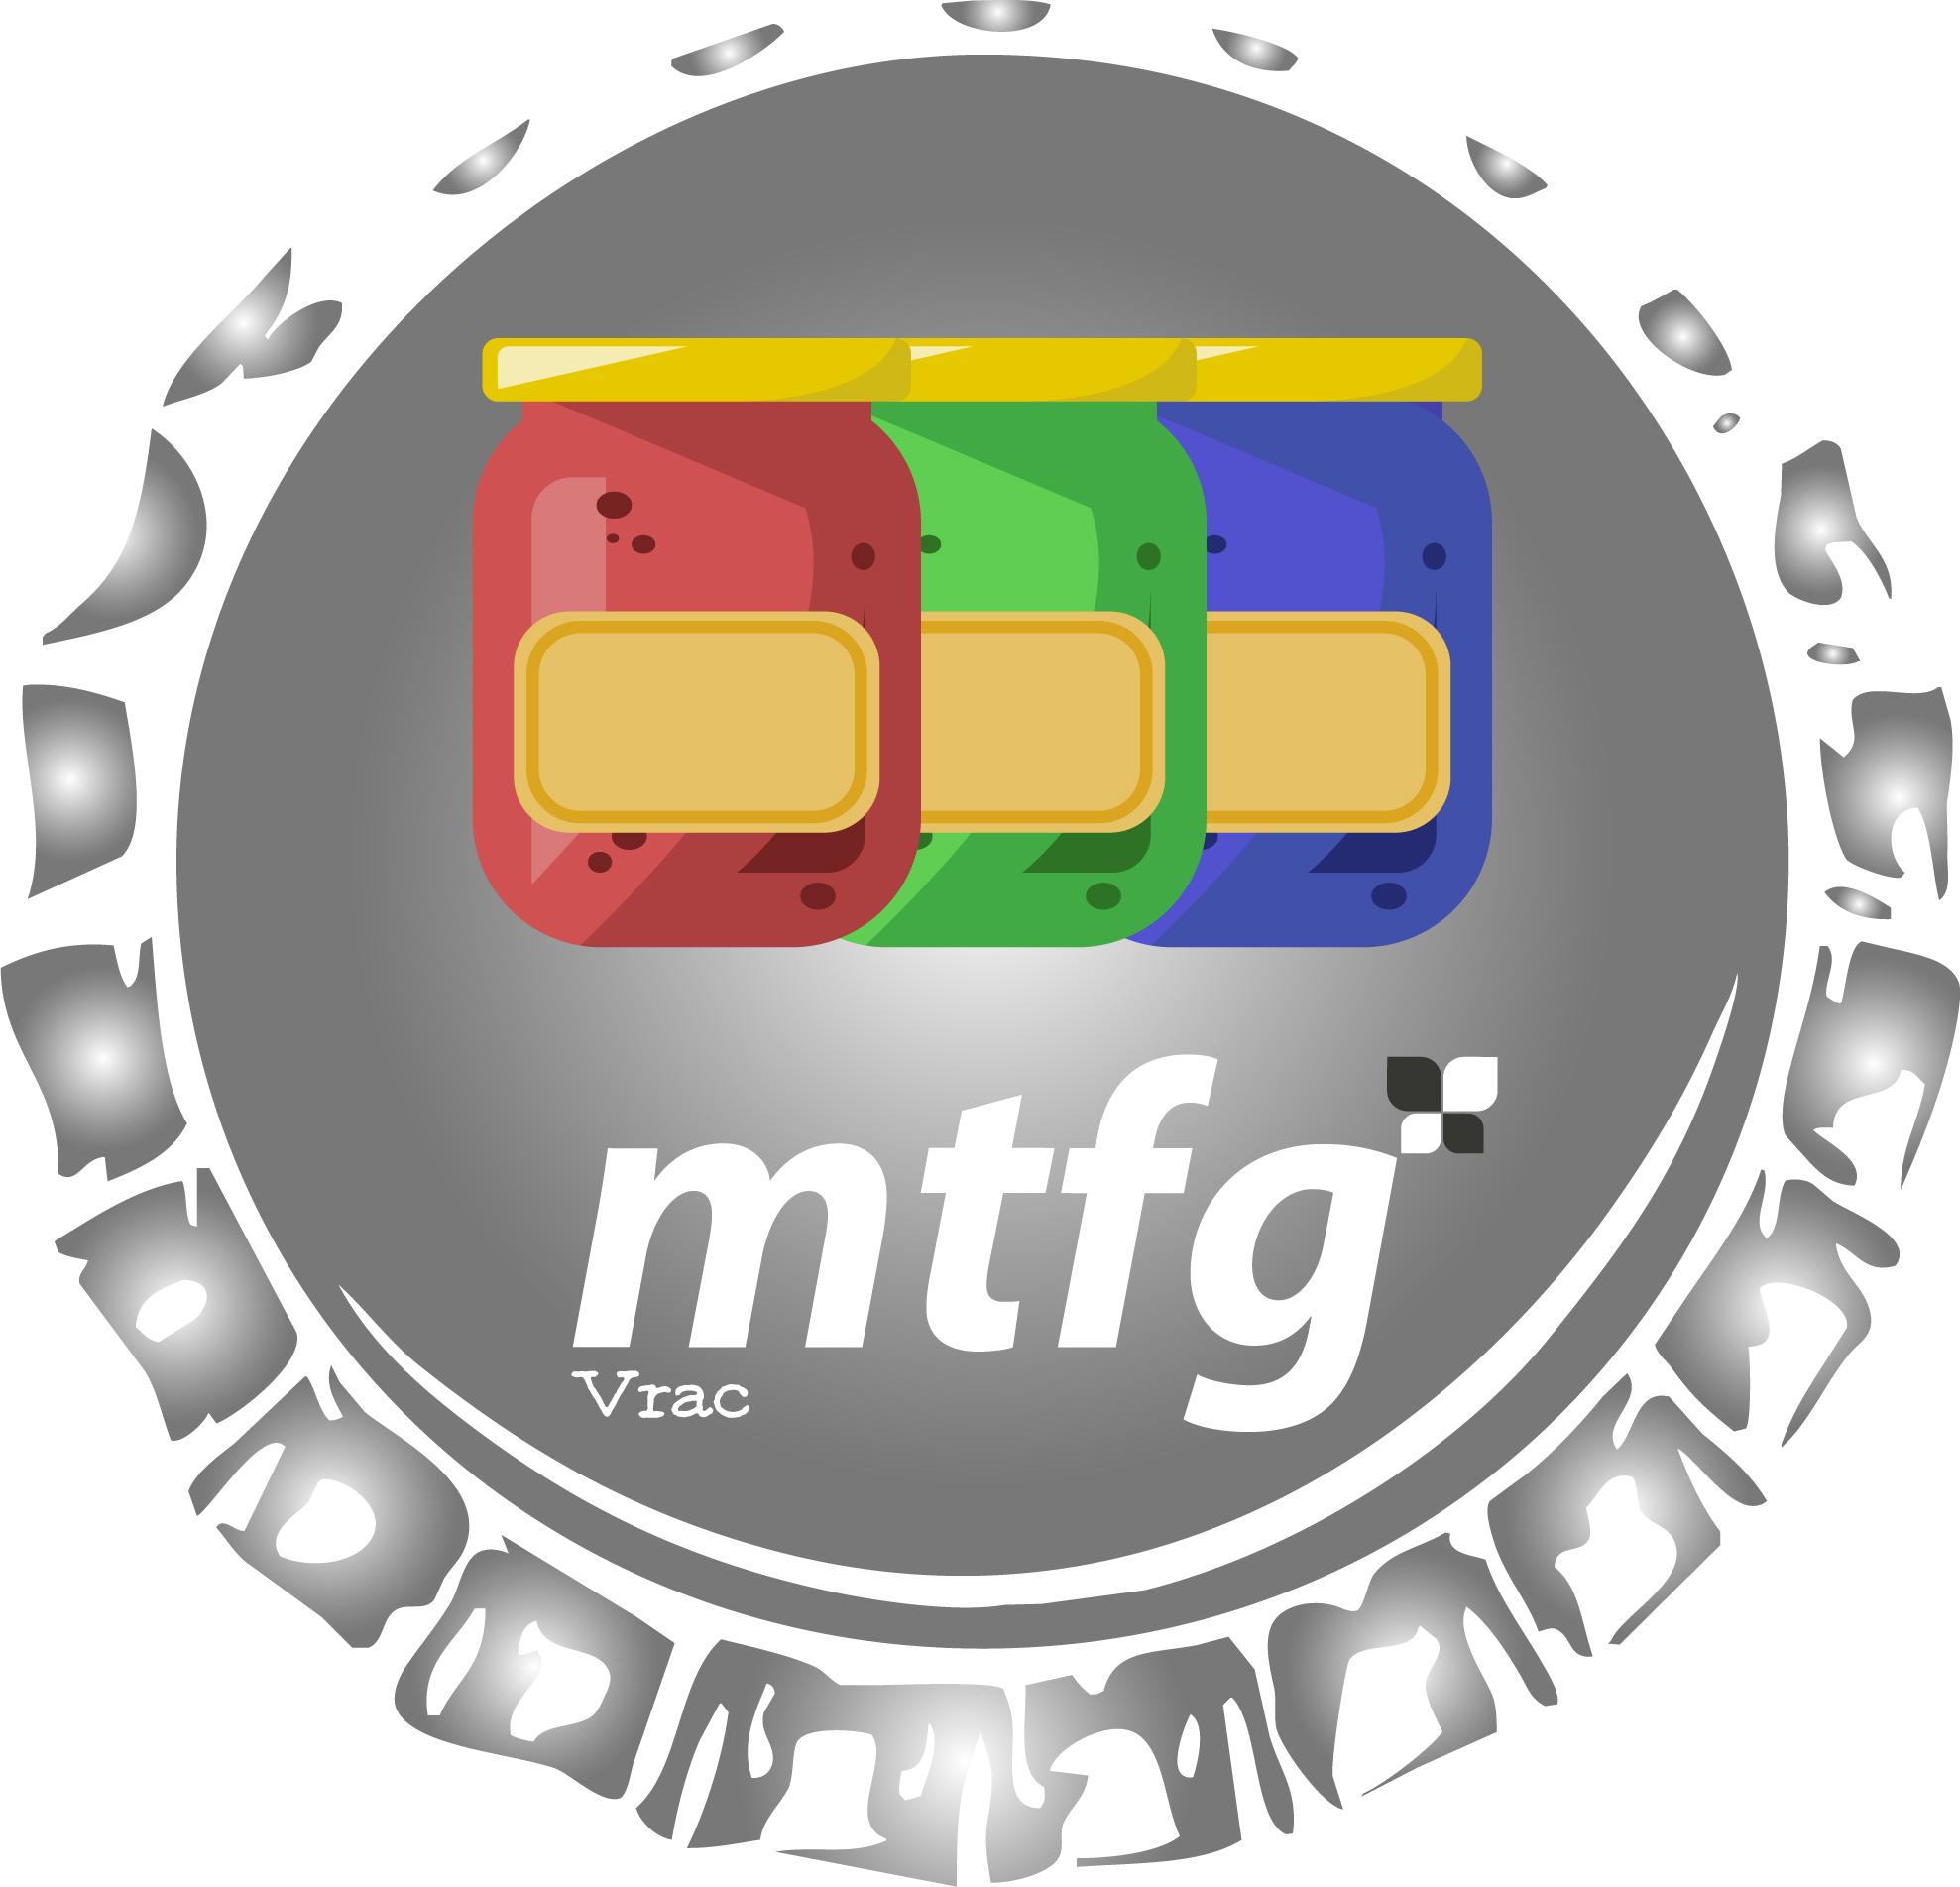 MTFG Vrac